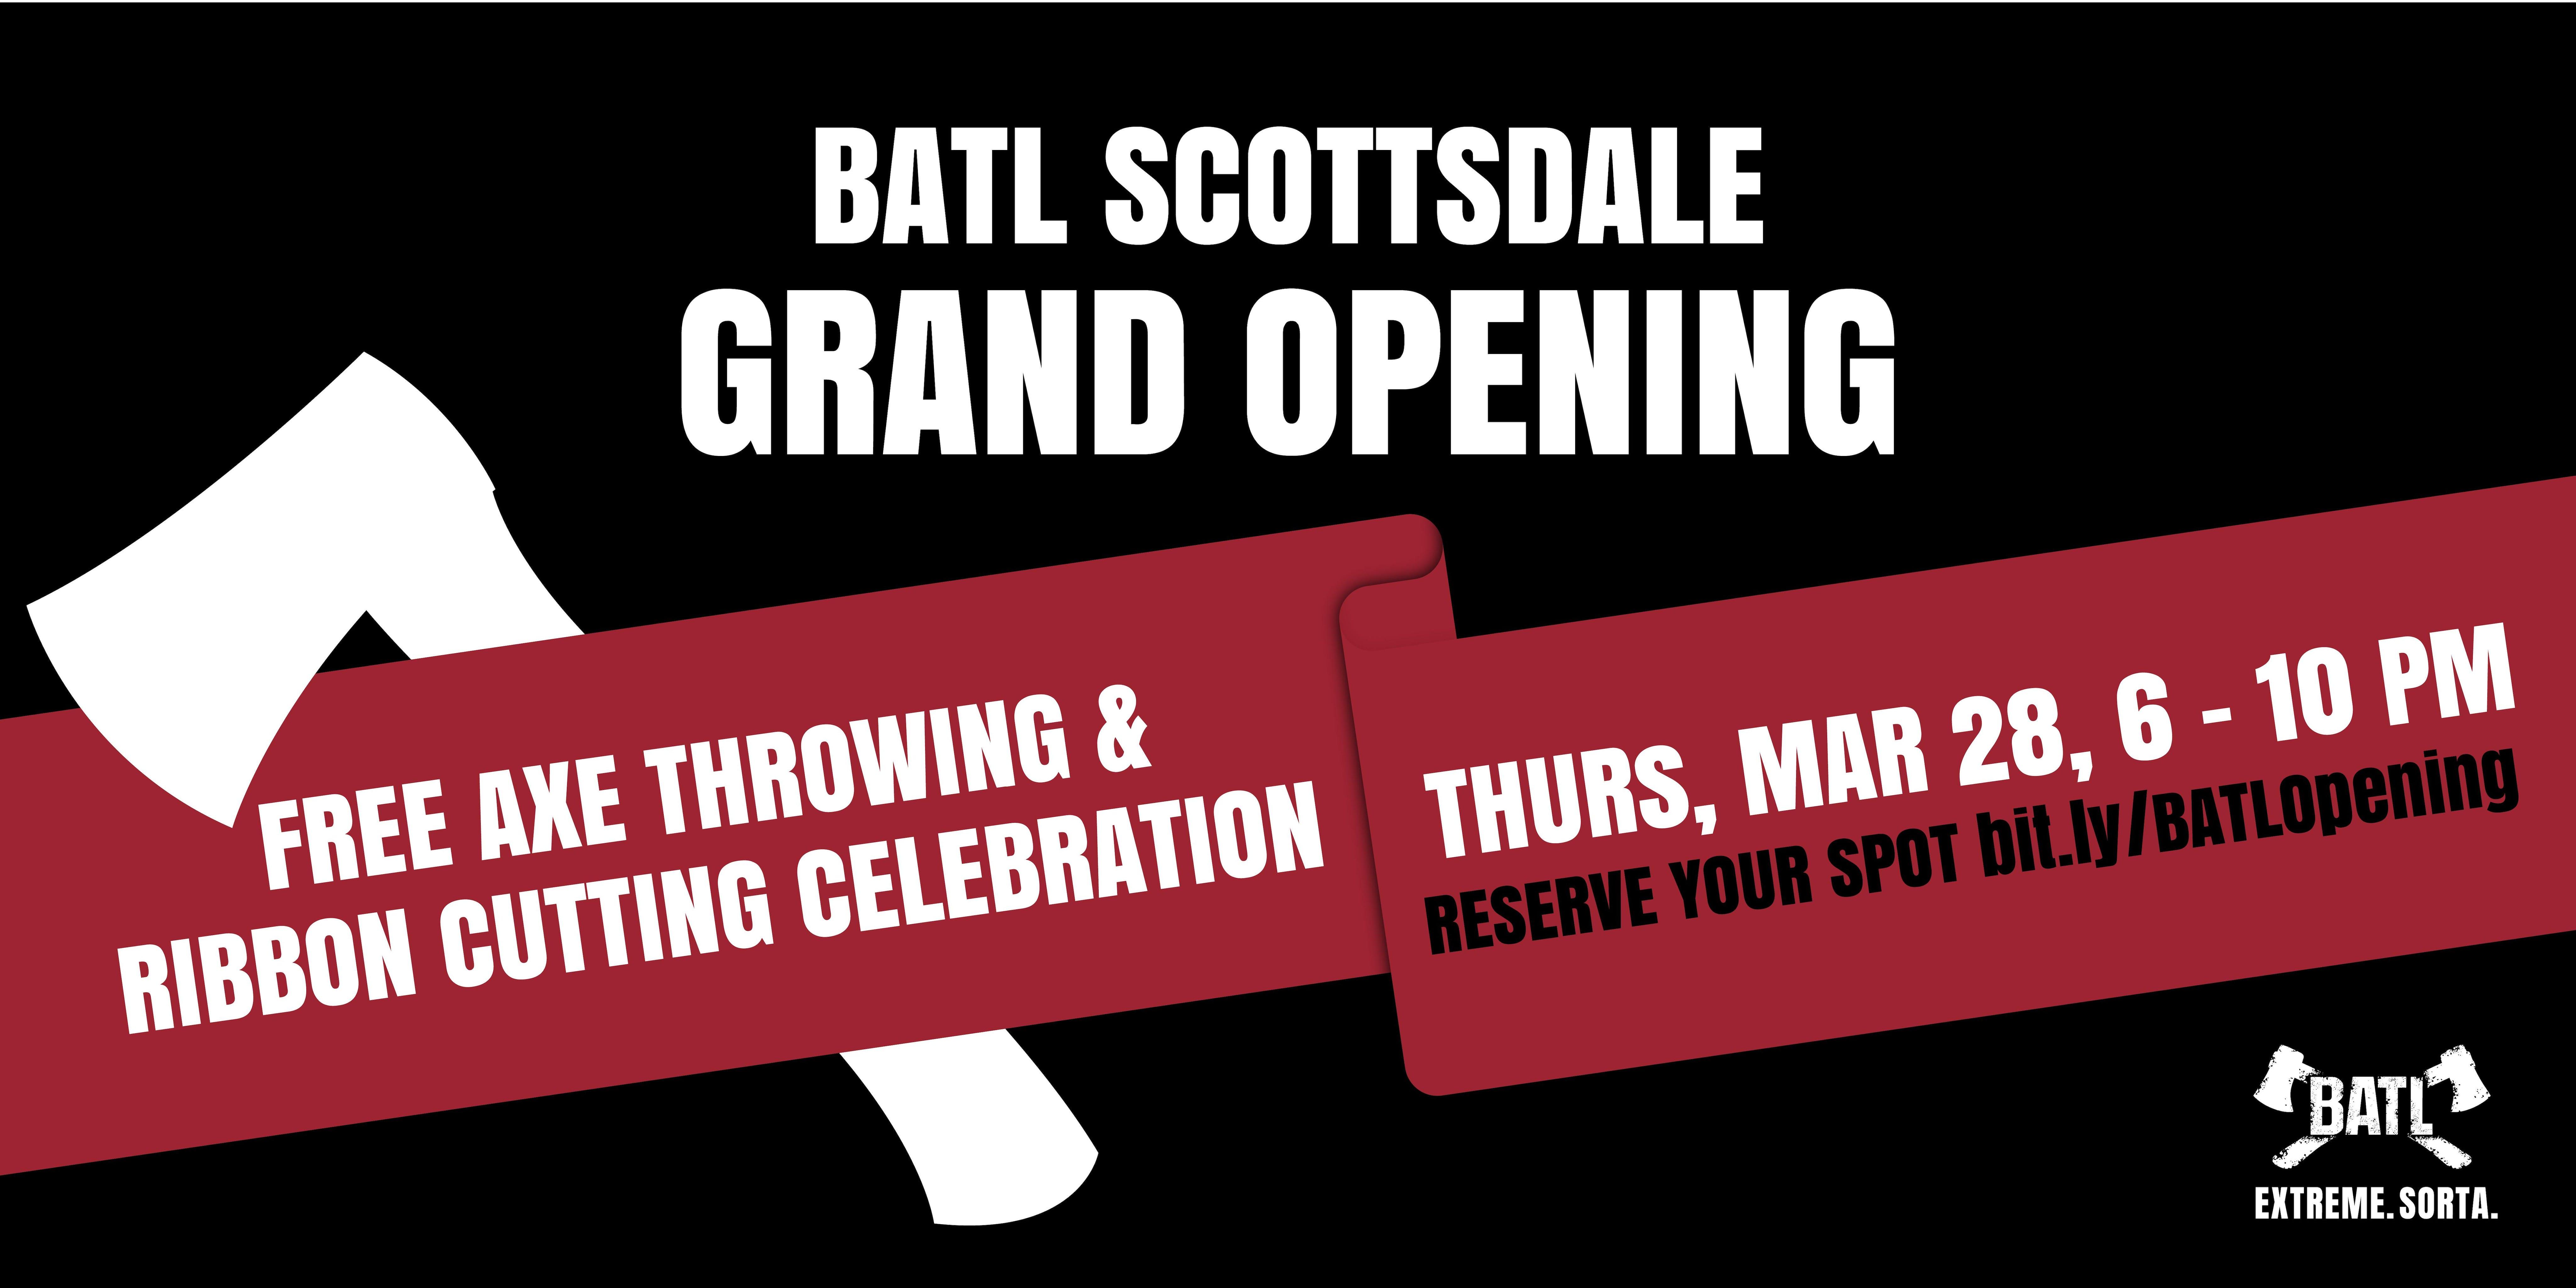 BATL Scottsdale Grand Opening